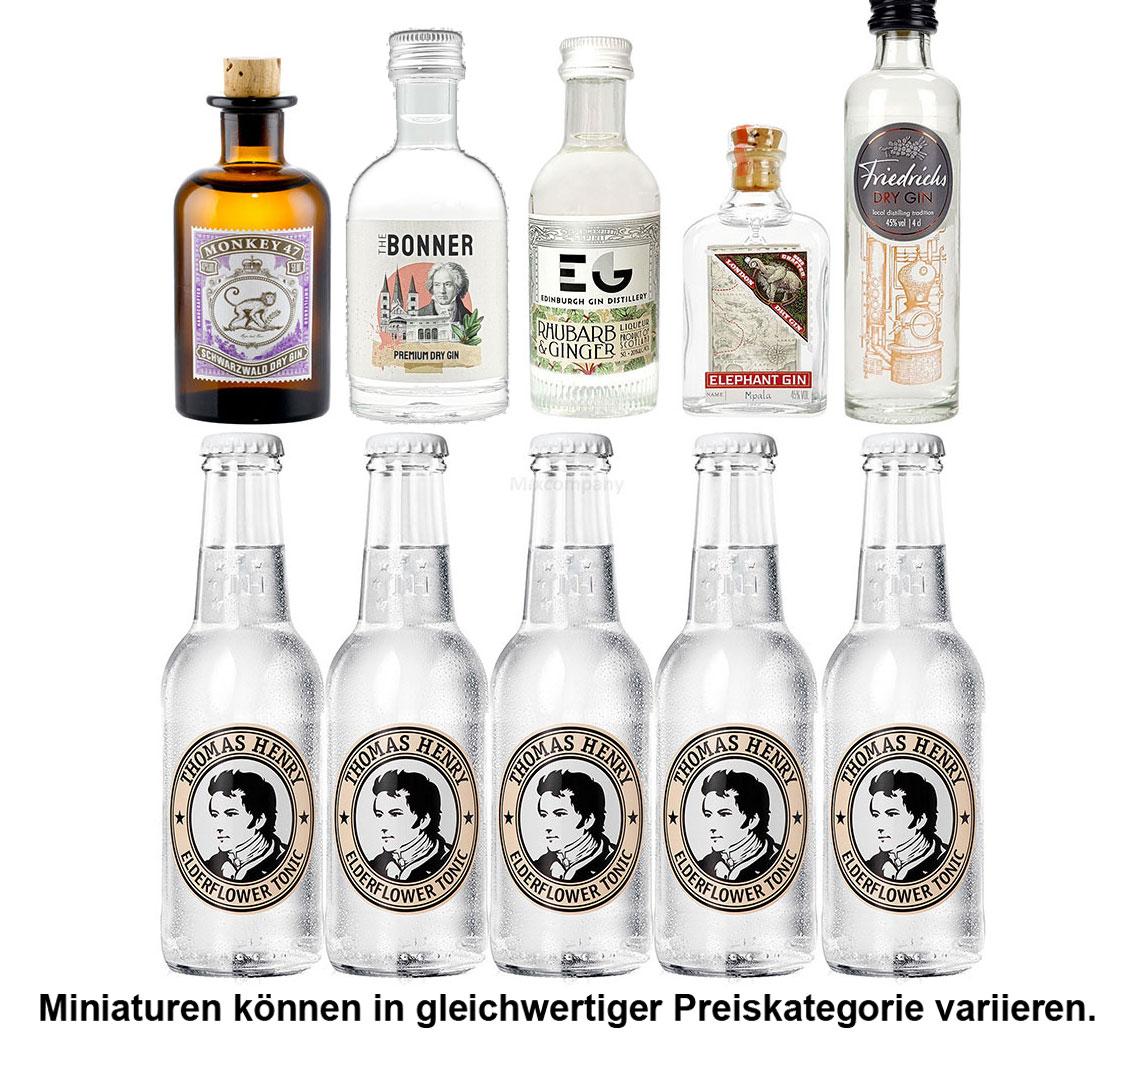 Gin Tonic Probierset - 5x Verschiedene Gin Sorten je 50ml + 5x Thomas Henry Elderflower 200ml inkl. Pfand MEHRWEG - NEU